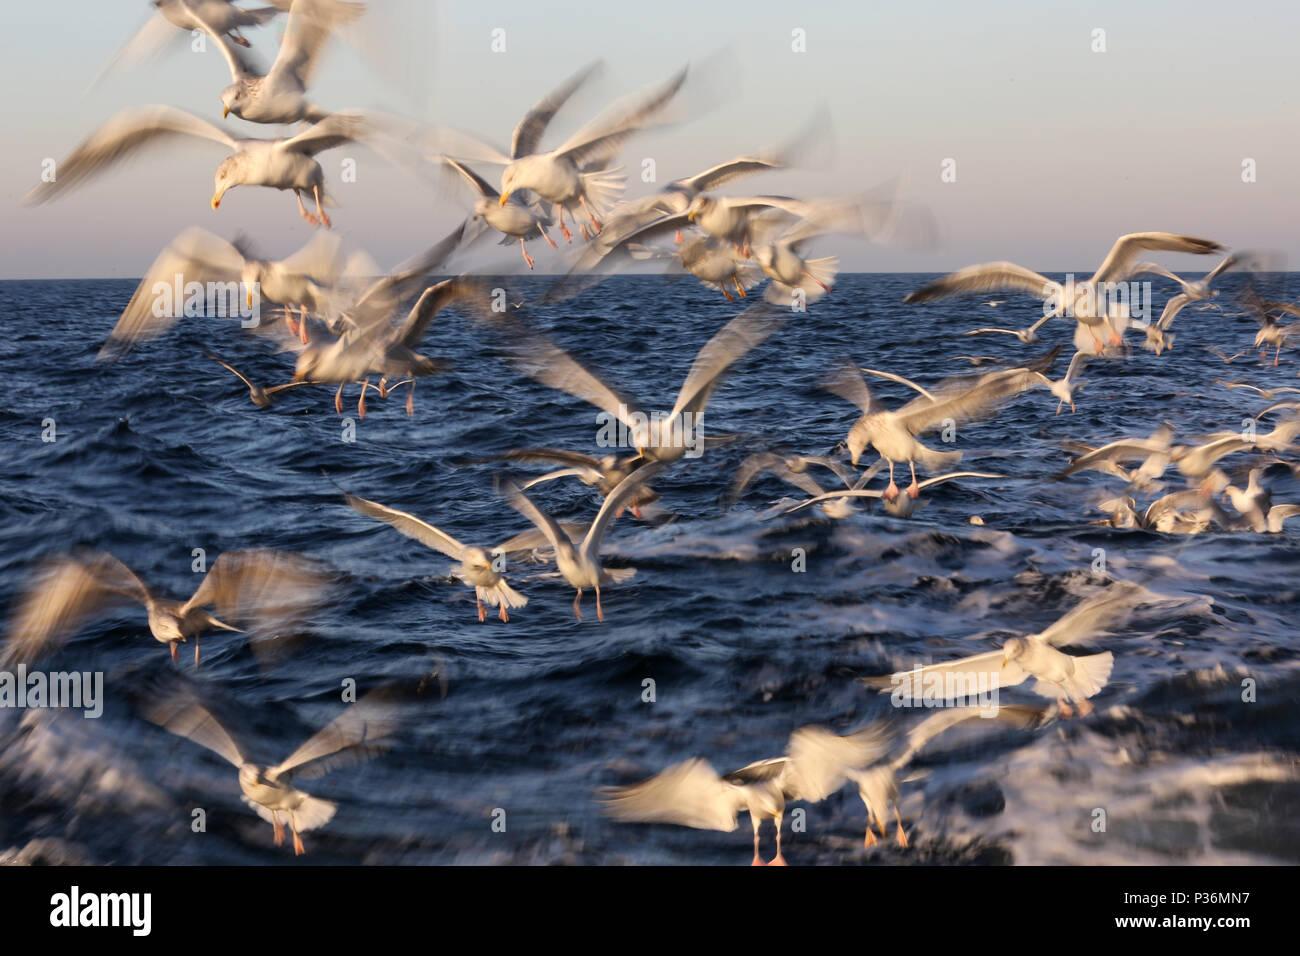 Wismar, Germany, Moewen in flight over the Baltic Sea - Stock Image